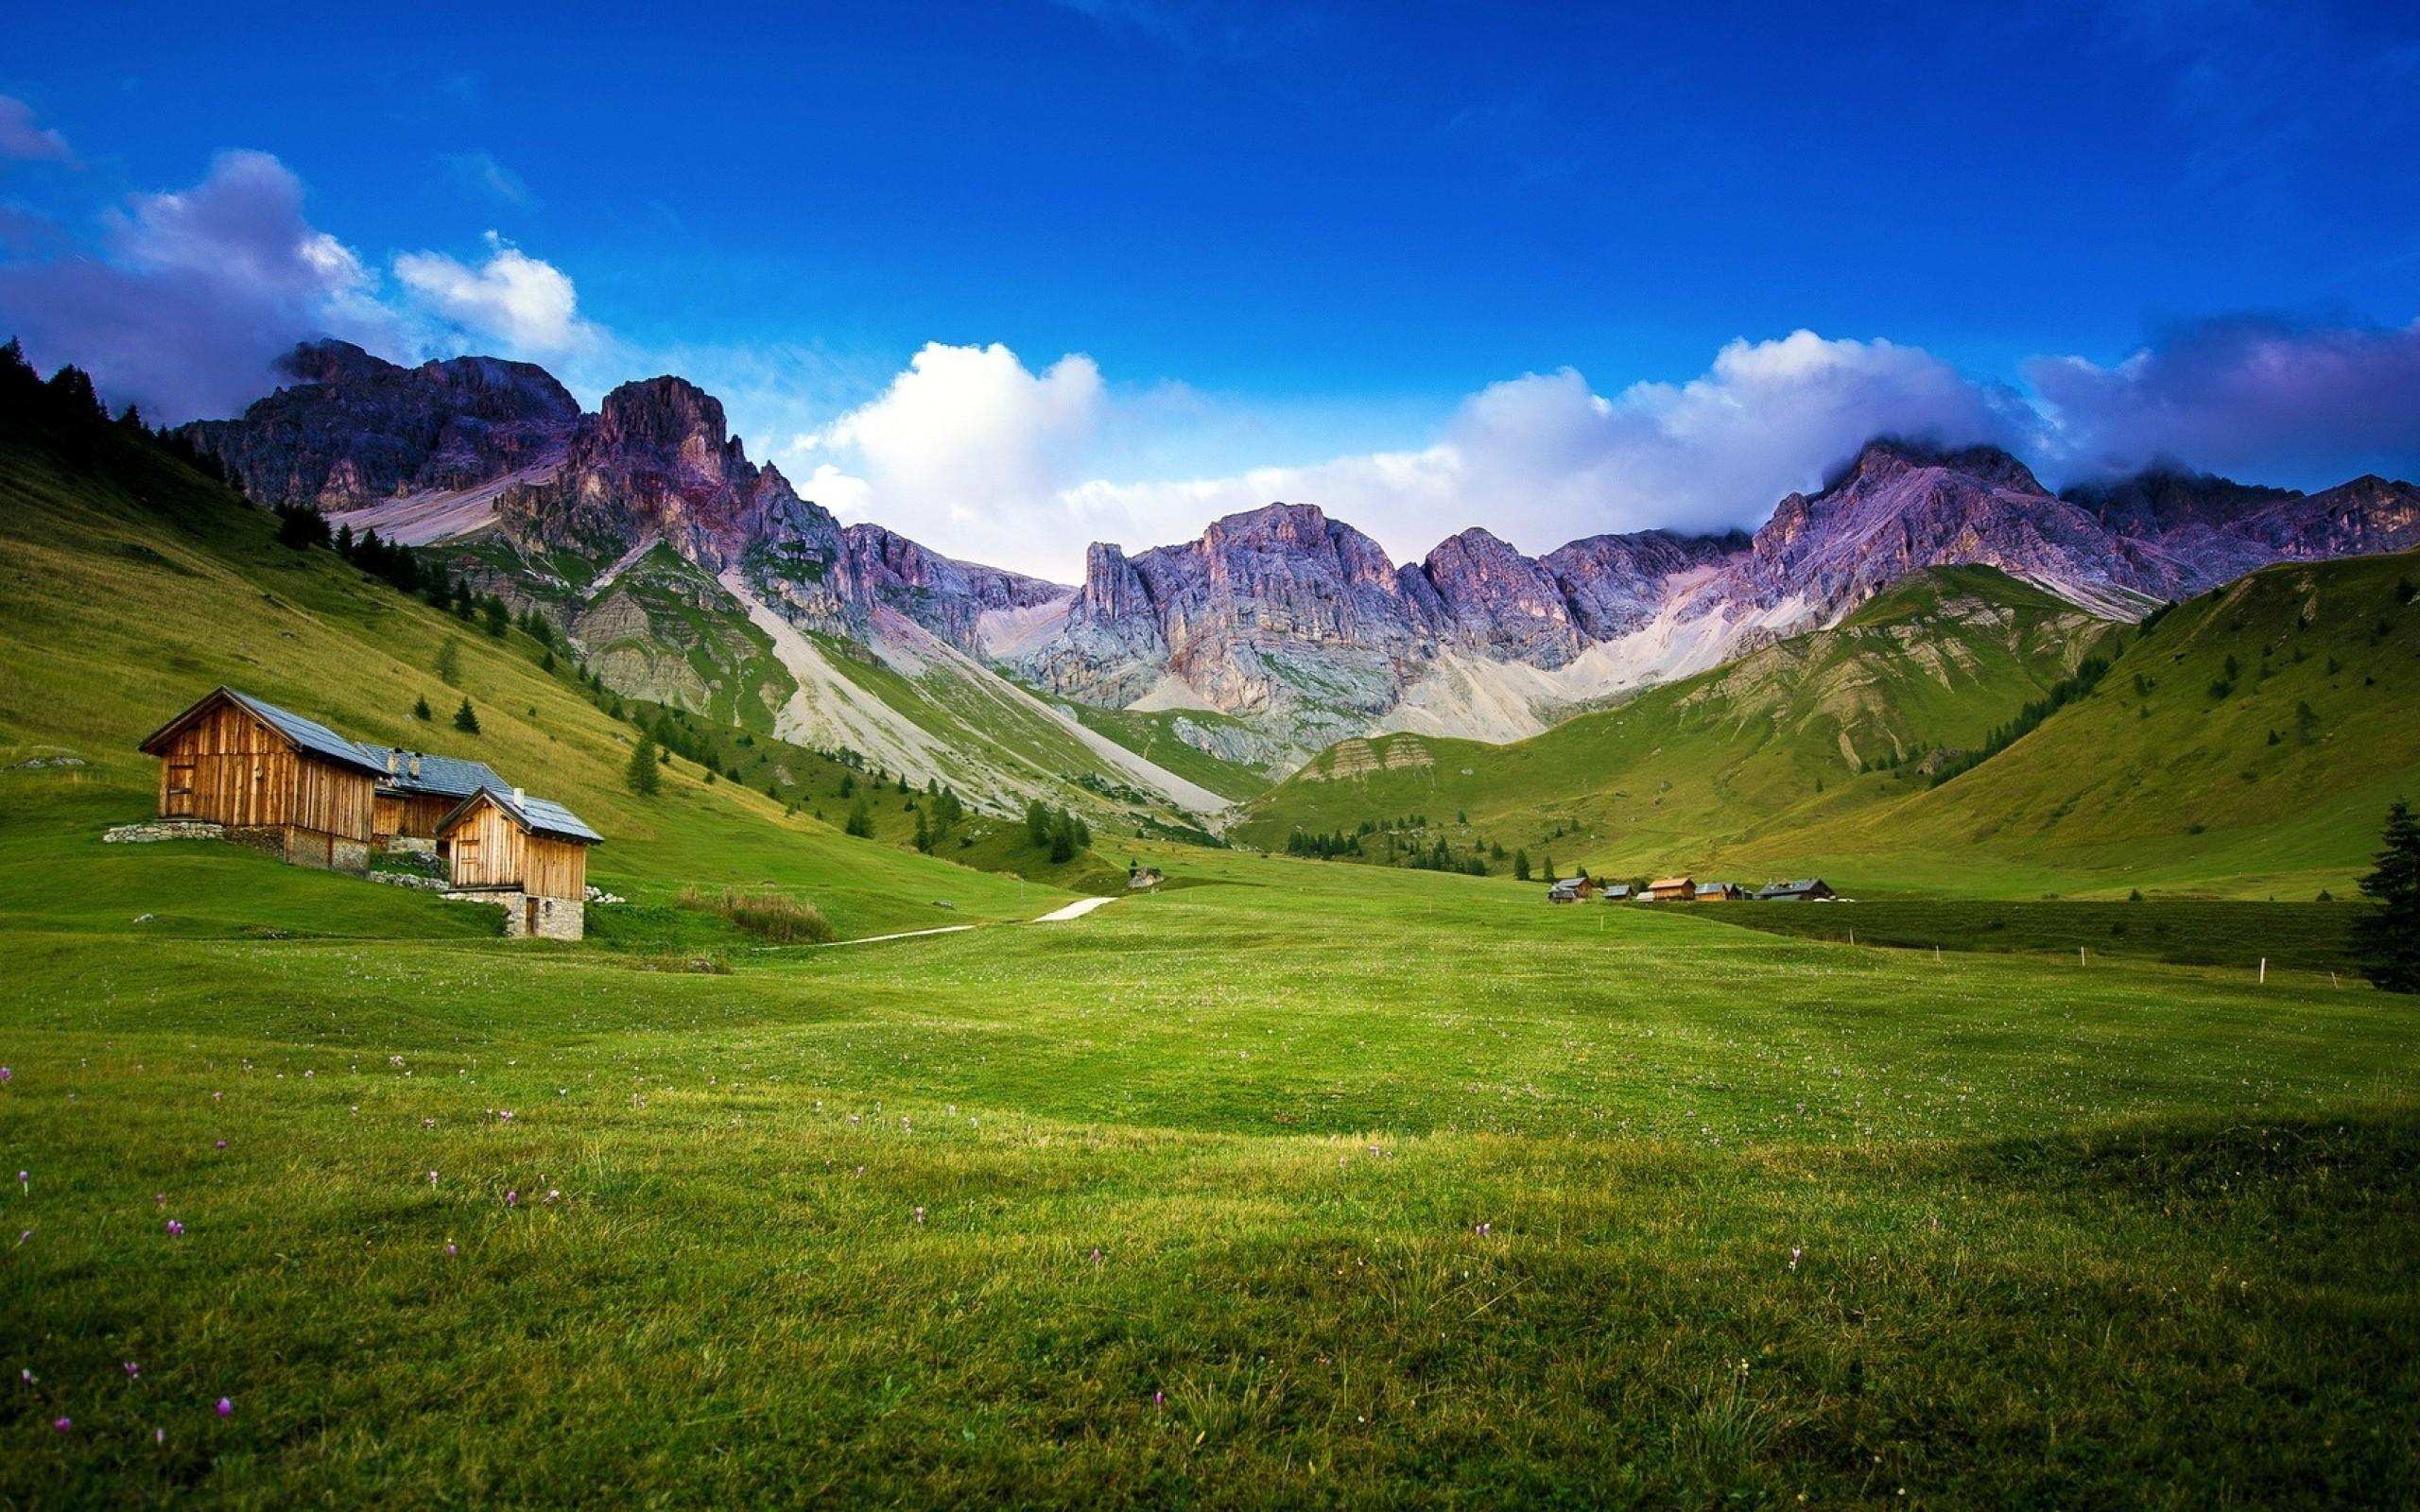 Green mountain valley wallpaper Wallpaper Wide HD 2560x1600